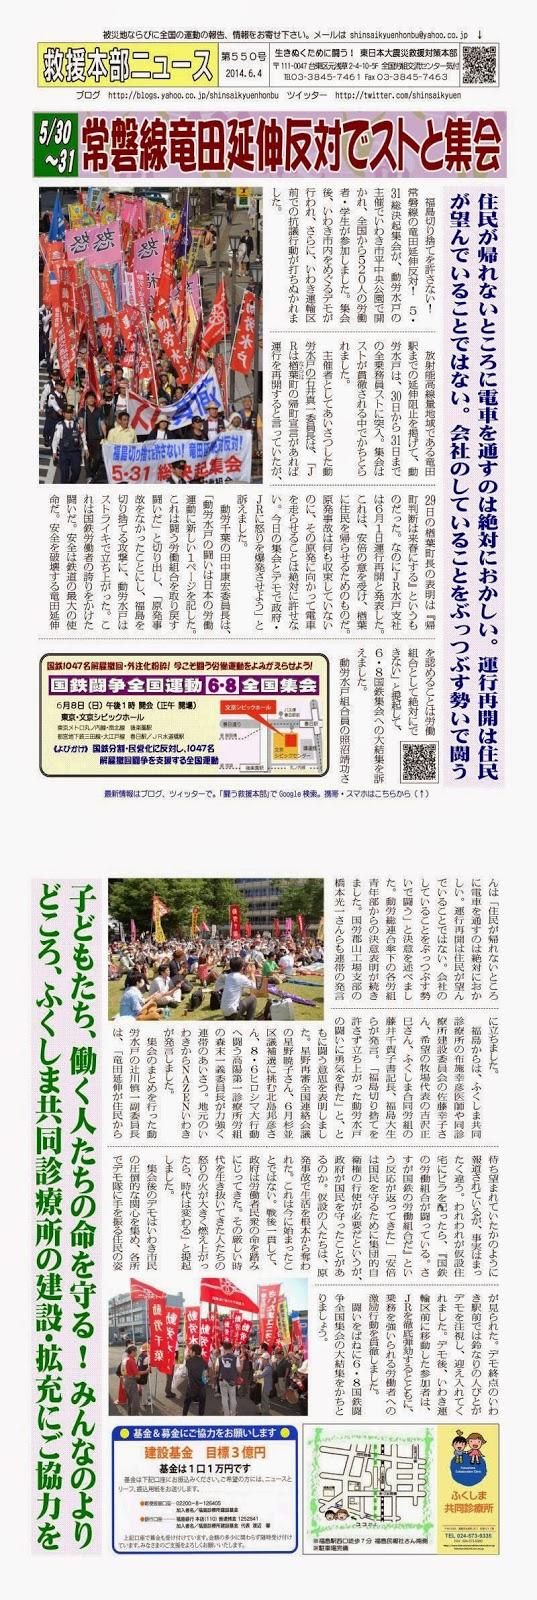 http://www.geocities.jp/shinsaikyuenhonbu/honbu550.pdf